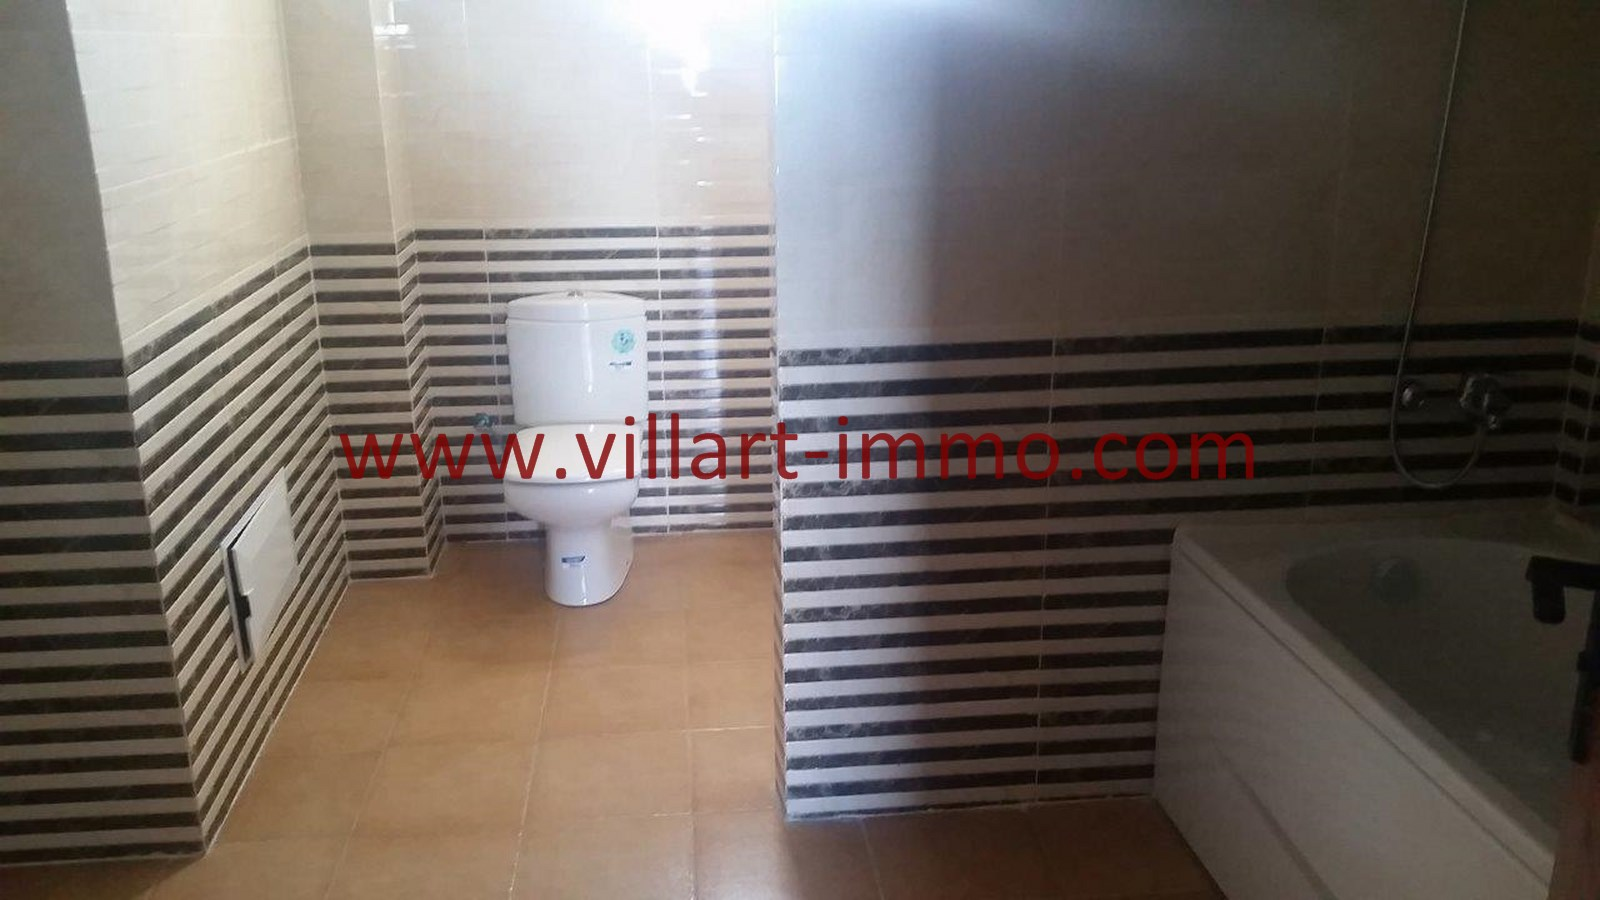 9-vente-appartement-region-tetouan-mdiq-salle-de-bain-1-va395-villart-immo